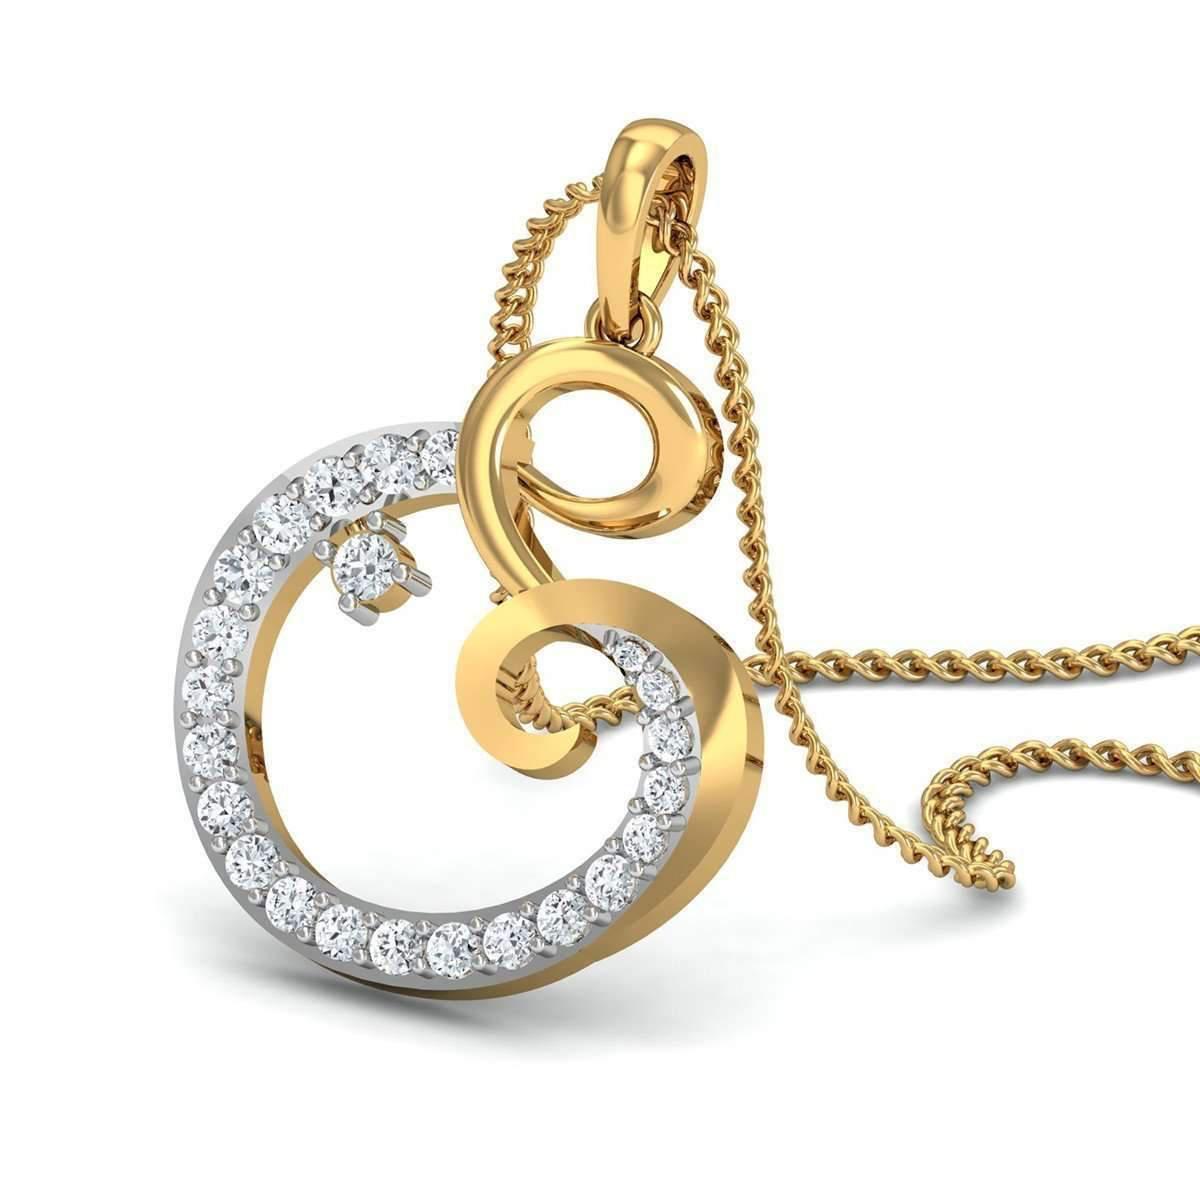 Diamoire Jewels Round Cut 24 Diamonds Pave Pendant in 14kt Yellow Gold UEZAhiU